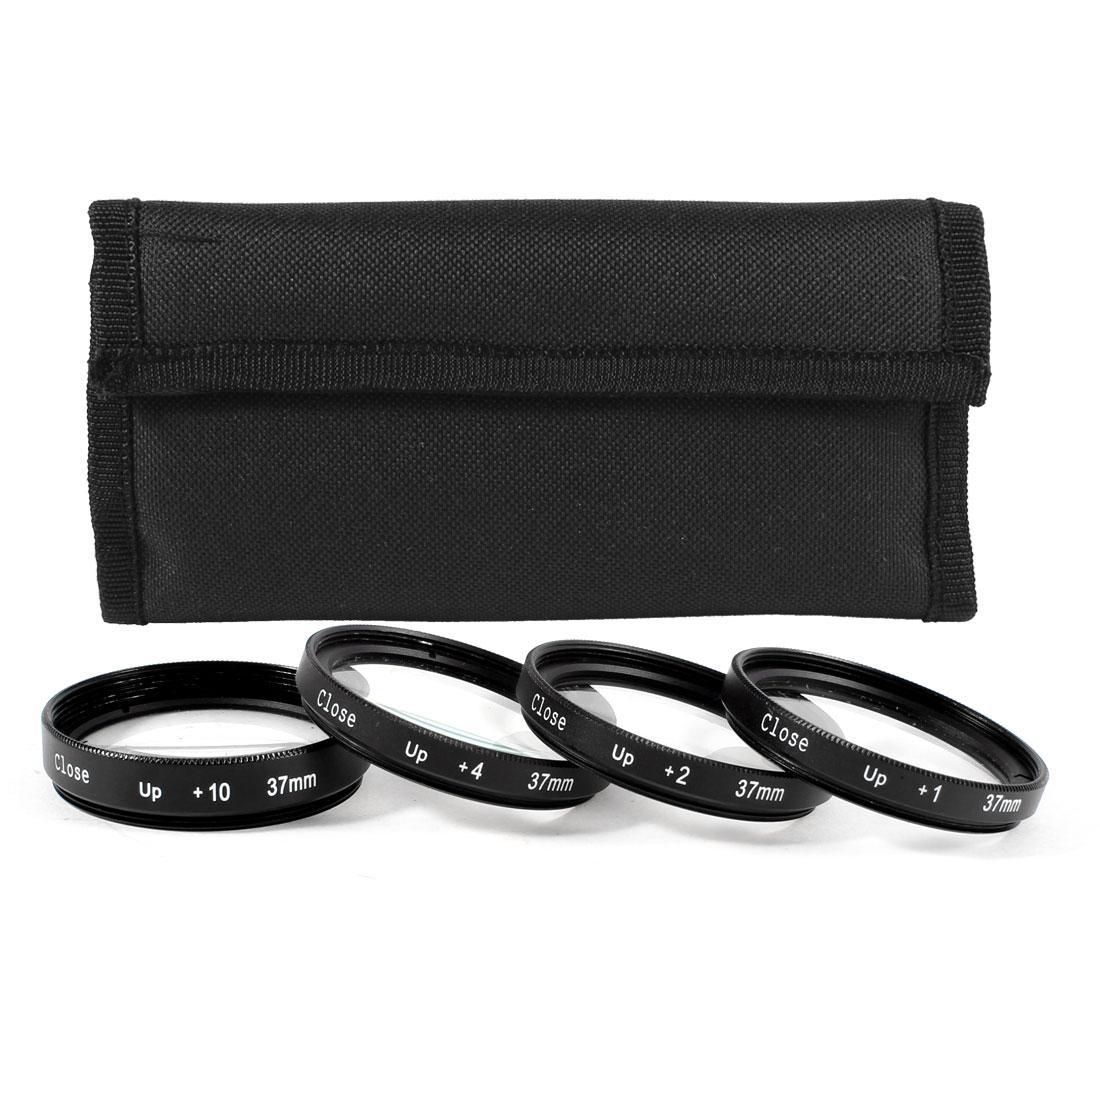 37mm Macro Close Up Lens +1 +2 +4 +10 Filter Kit for DSLR SLR Camera